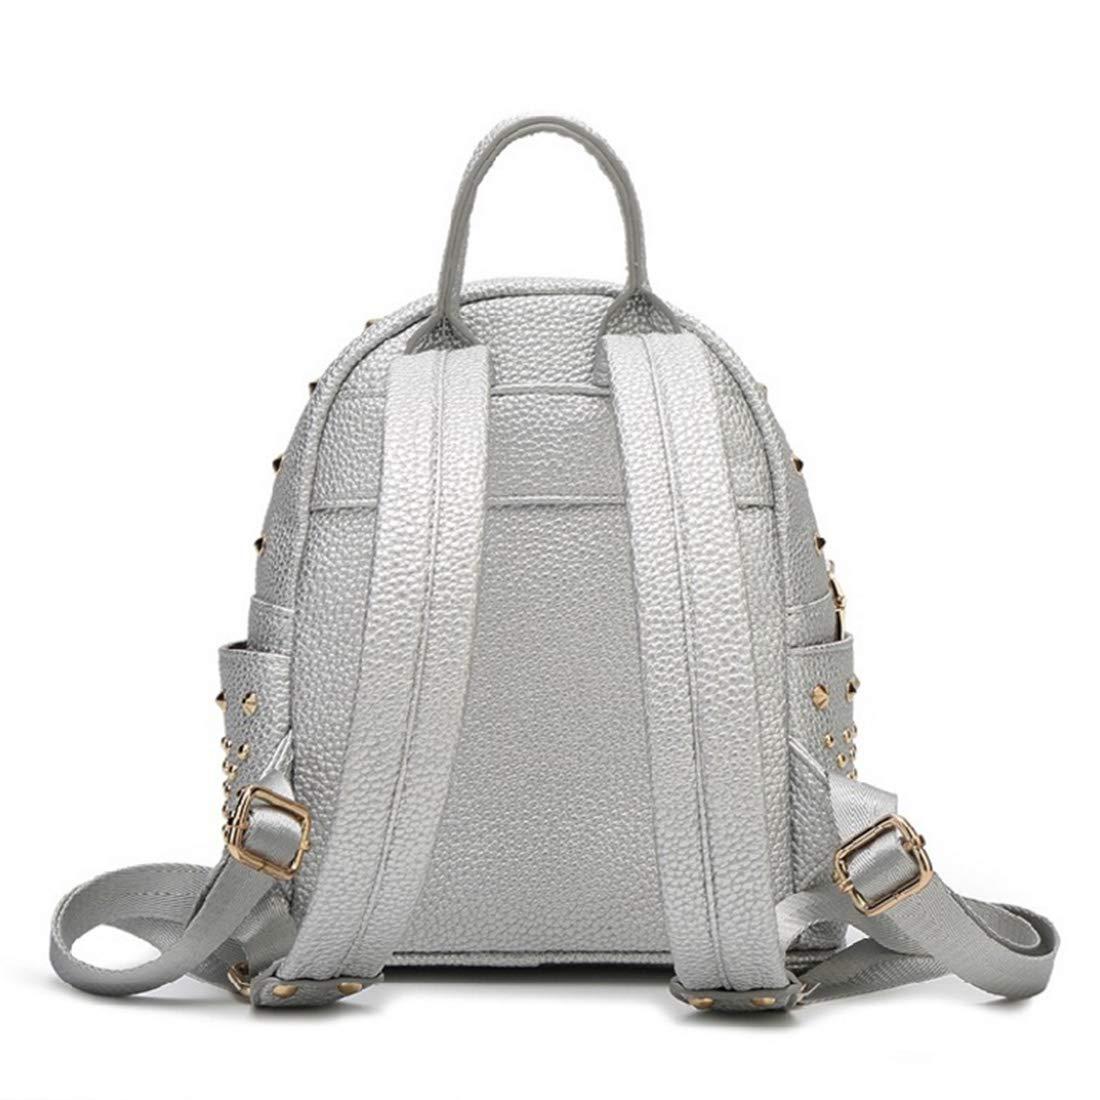 HOUYAZHAN Niet Rucksack Rucksack Tasche Damen Leder Leder Leder Mode Student Reiserucksack (Farbe   Silber) B07NDJW5NJ Rucksackhandtaschen Rechtzeitige Aktualisierung 37f530